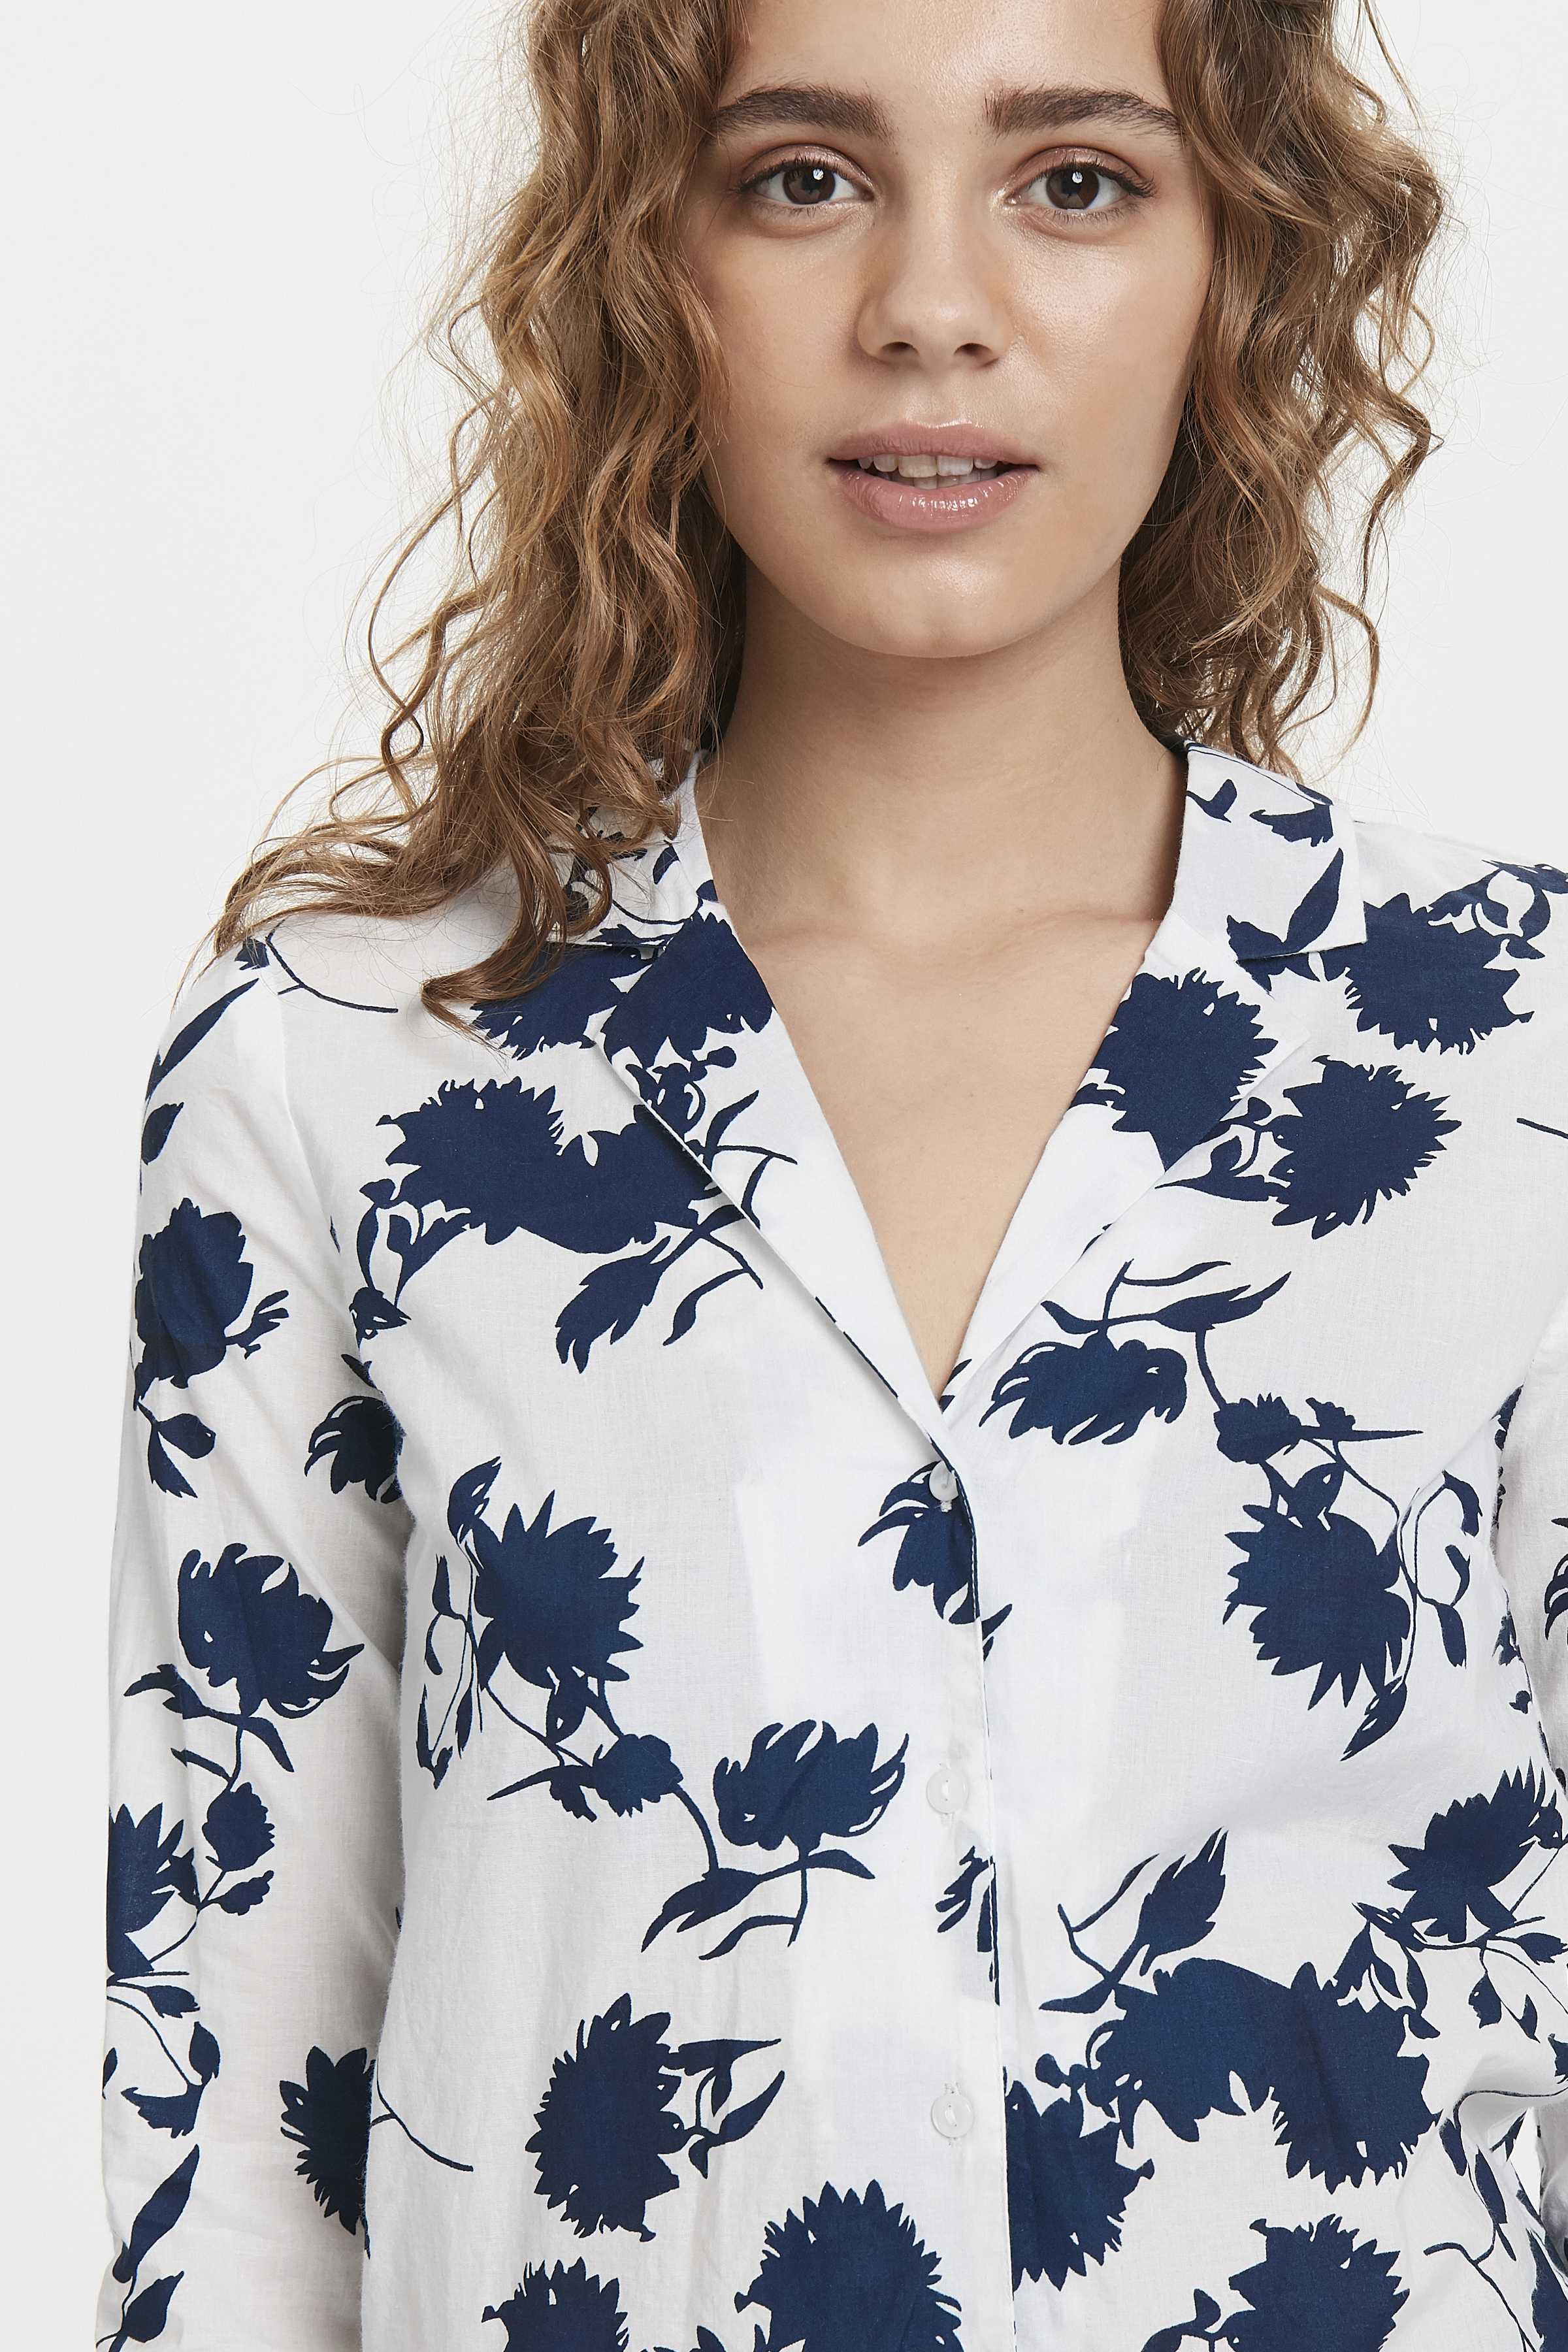 Cloud Dancer print Langærmet skjorte – Køb Cloud Dancer print Langærmet skjorte fra str. XS-XL her